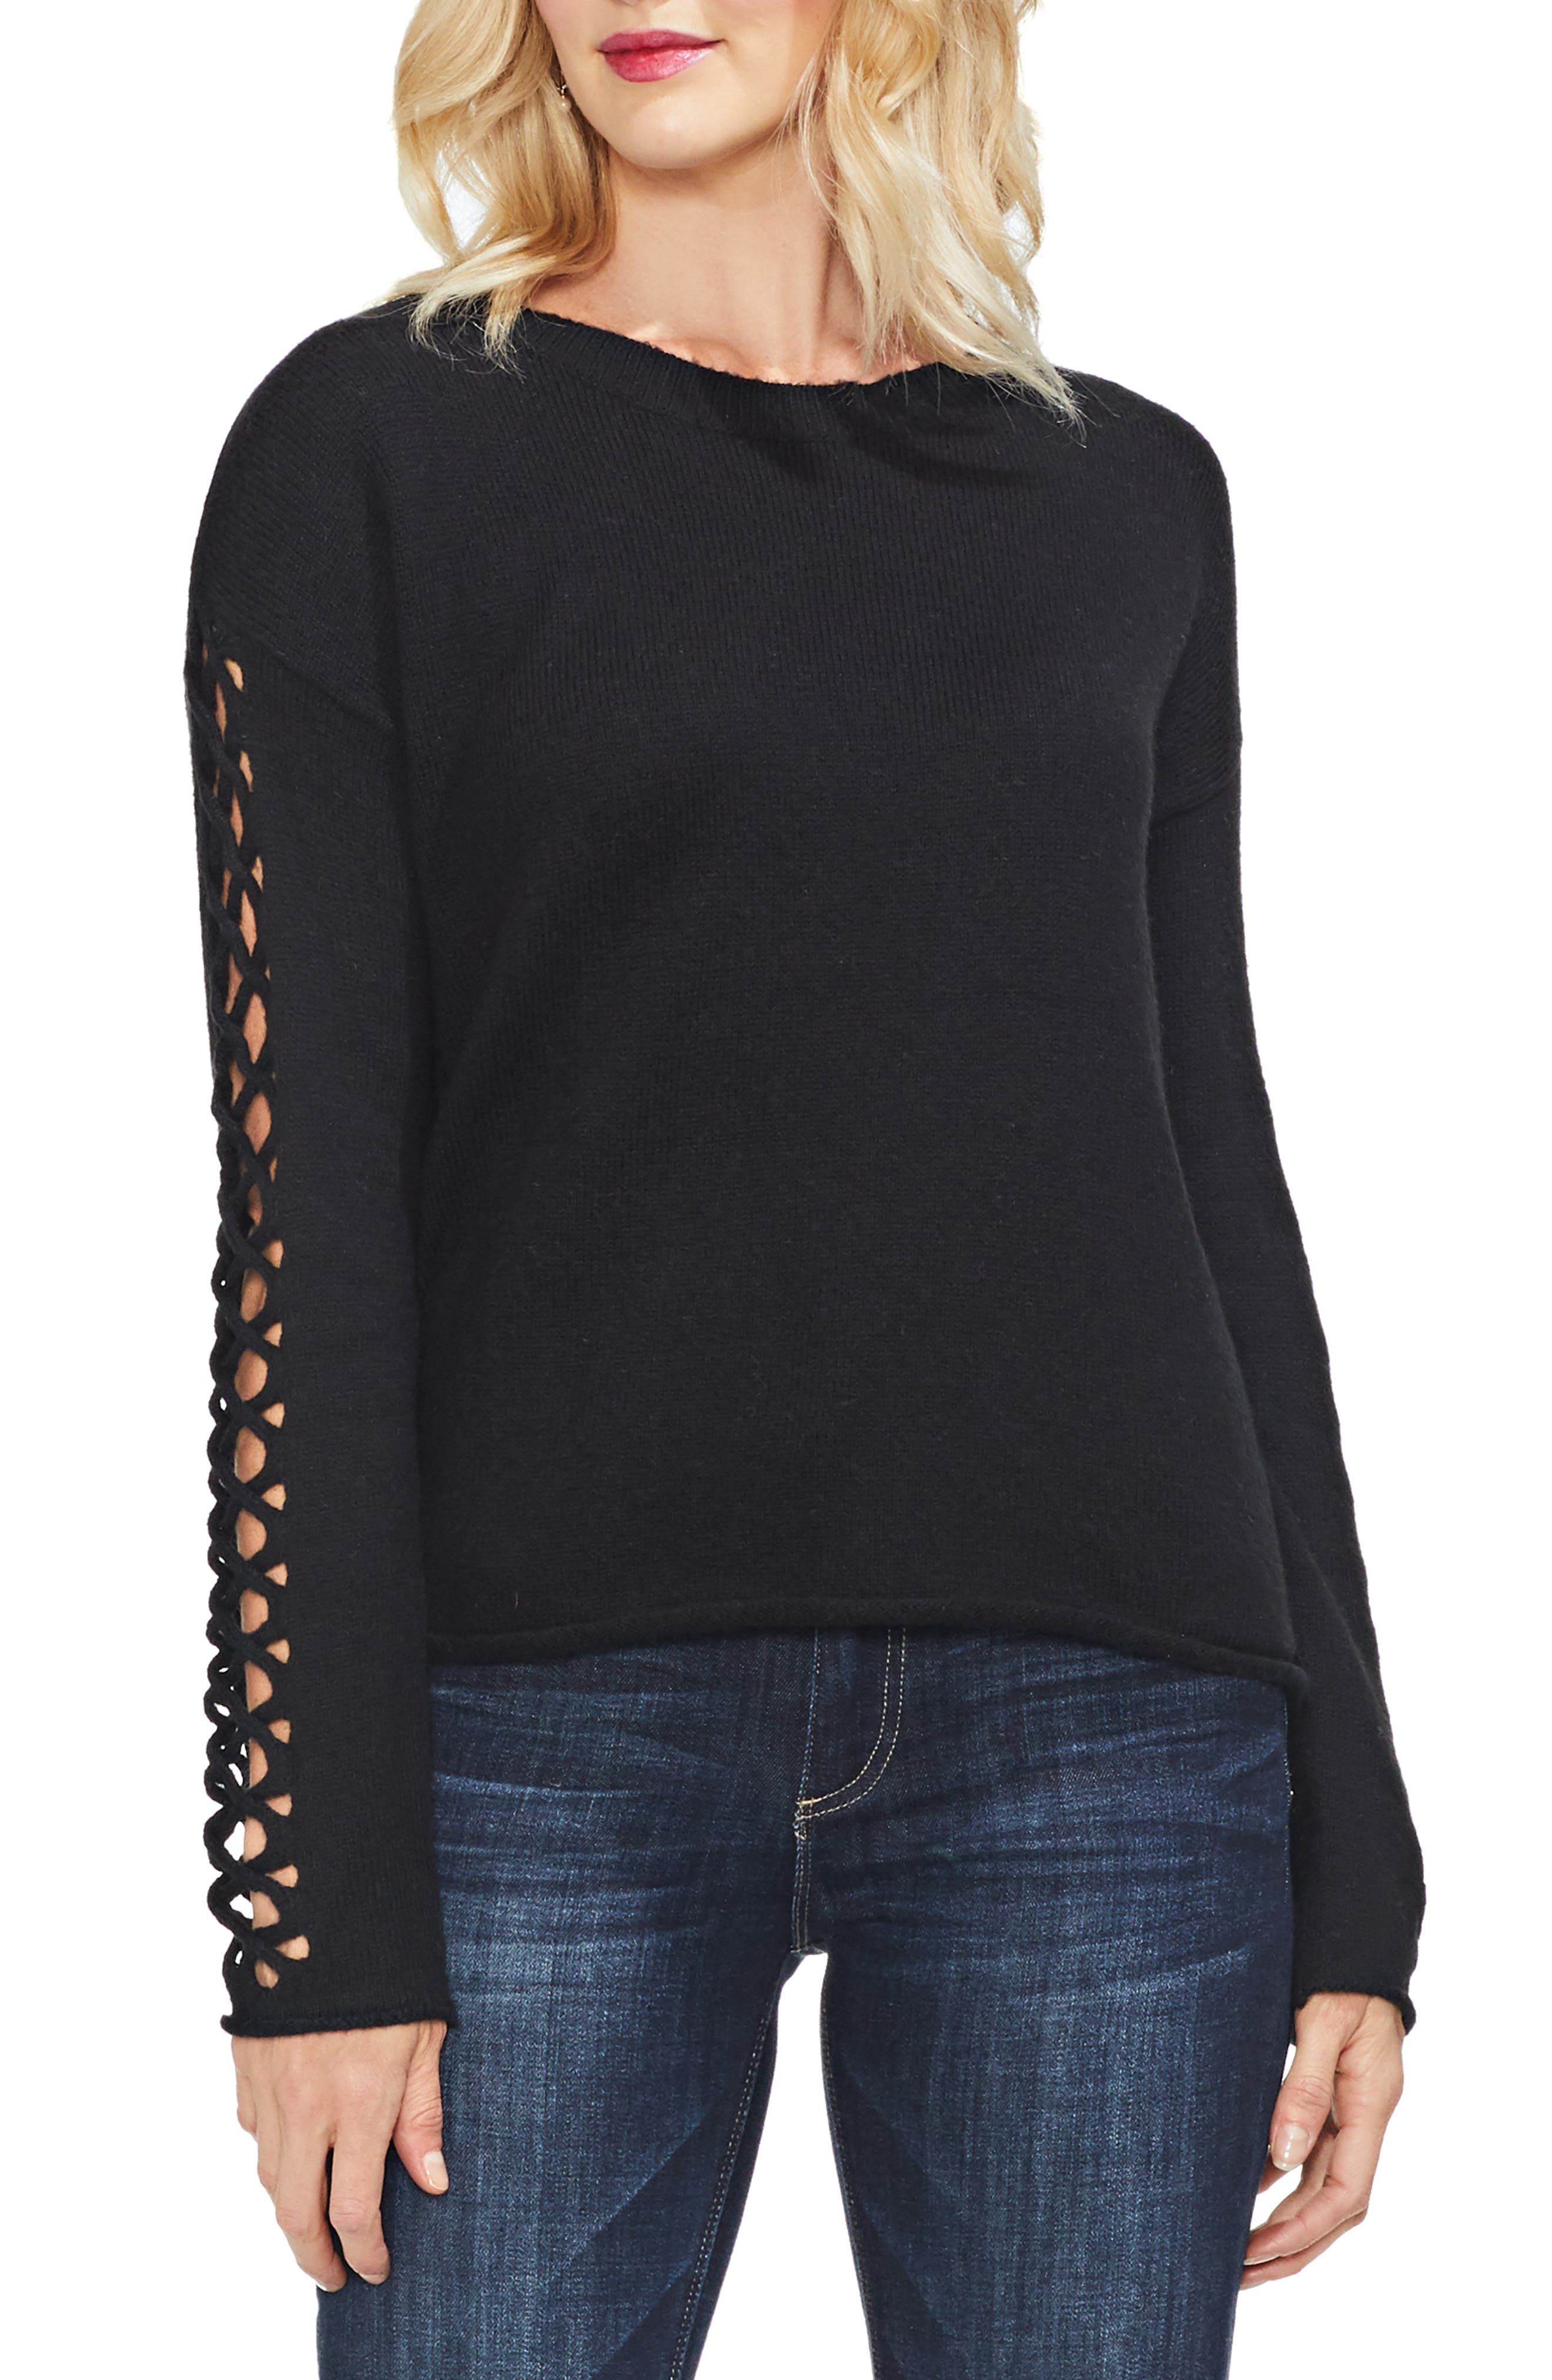 VINCE CAMUTO,                             Lattice Sleeve Cotton Blend Sweater,                             Main thumbnail 1, color,                             006